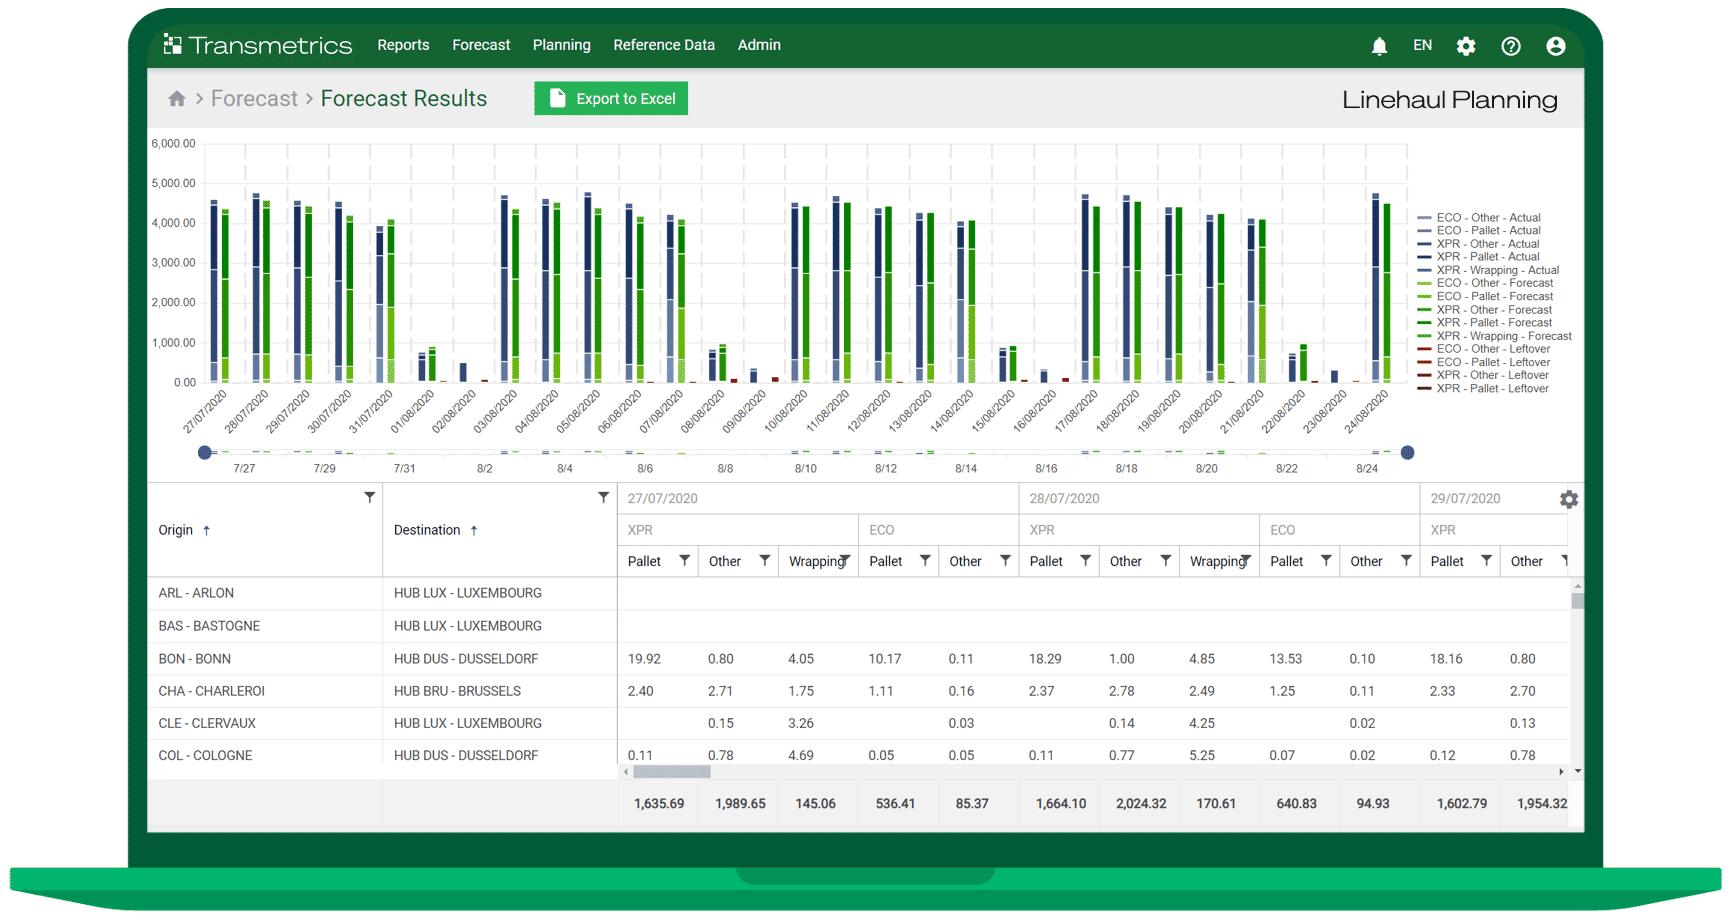 Transmetrics Predictive Linehaul Planning Solution: Forecast